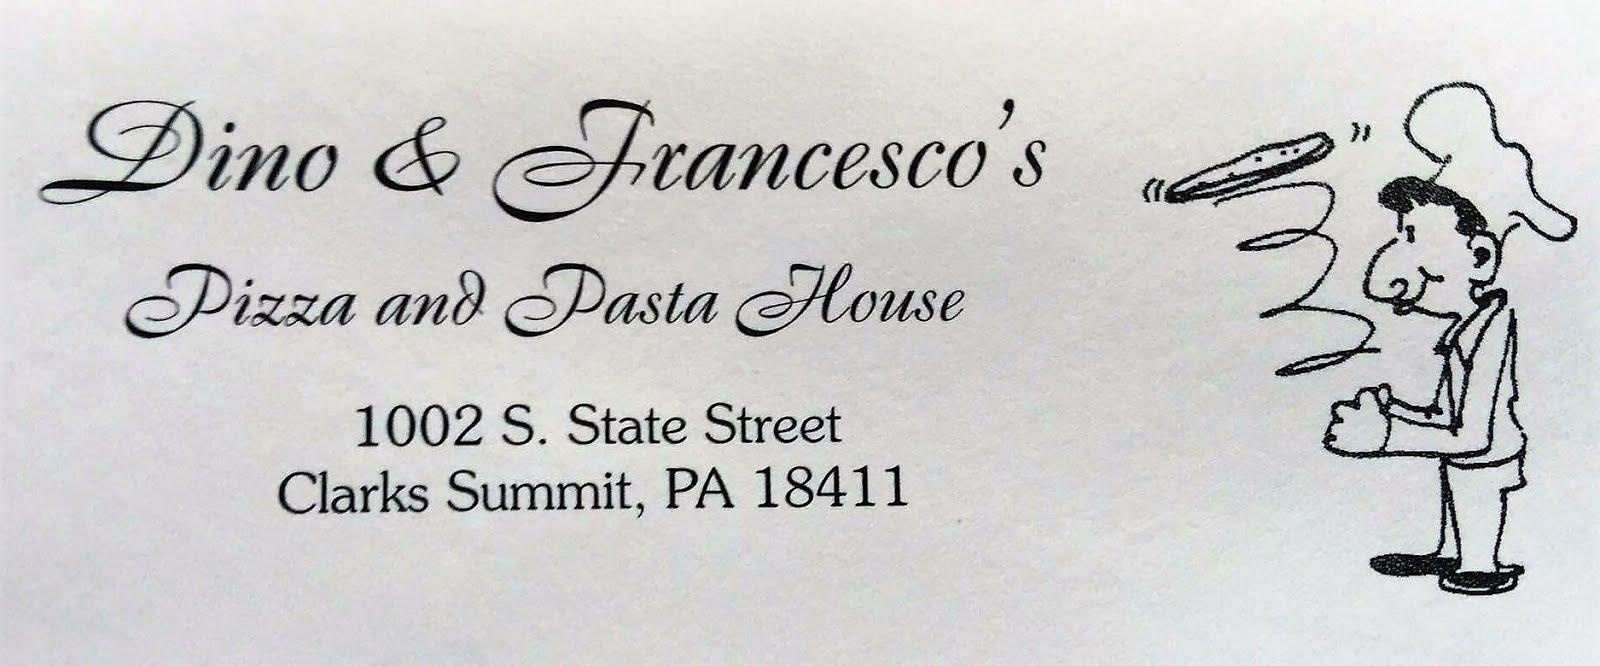 Visit Dino and Francesco's